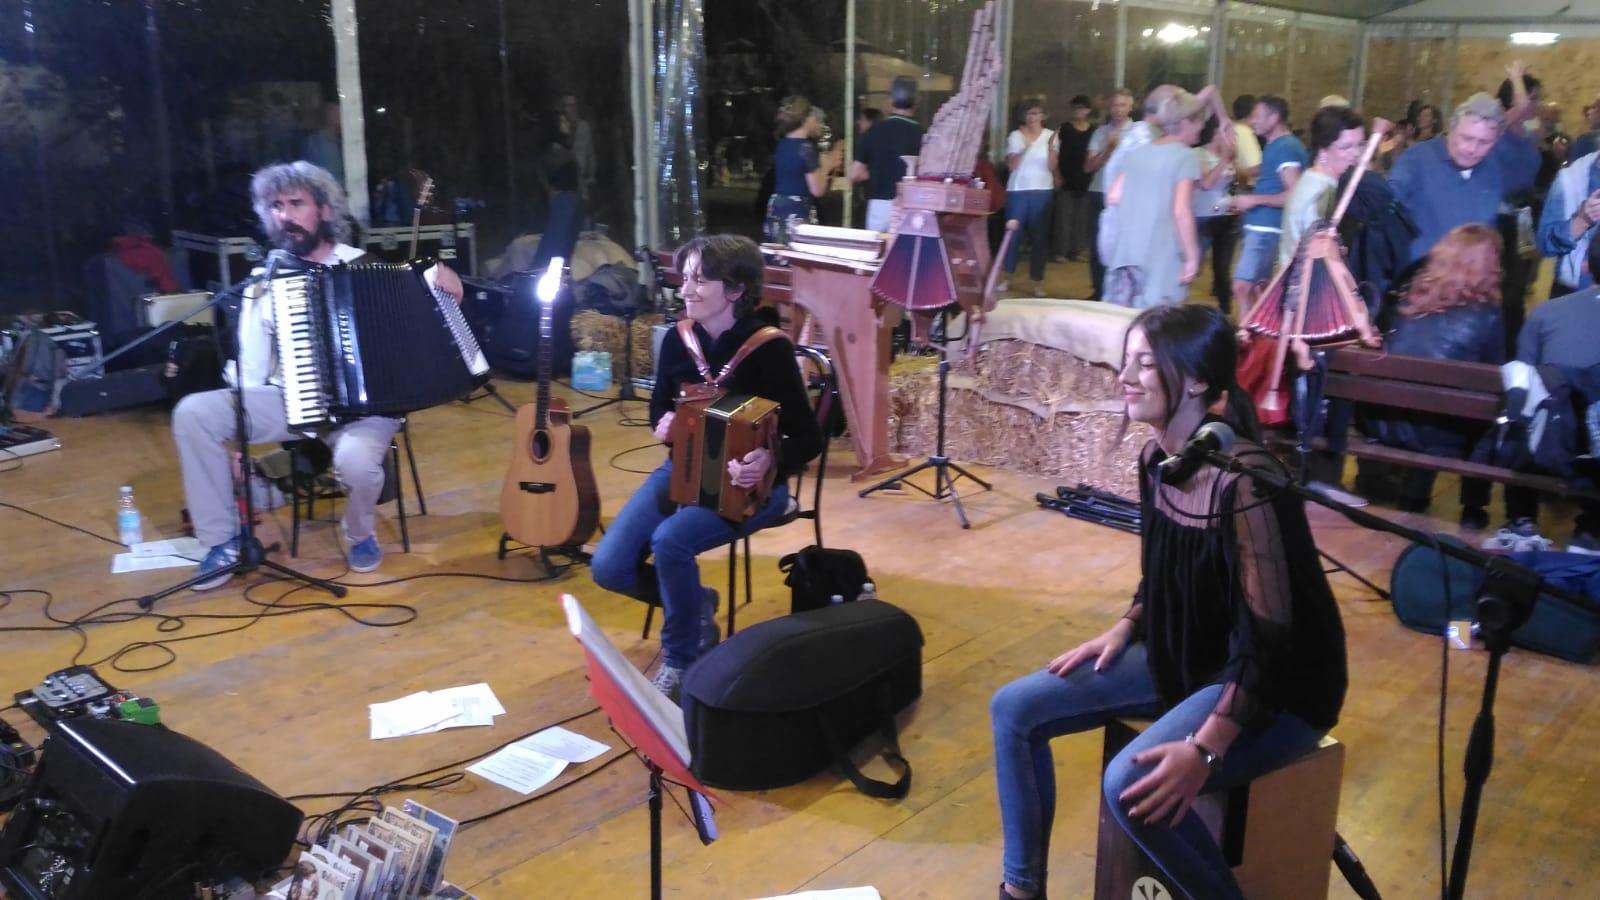 foto QuBa Libre - Simonetta Baudino, Giuseppe Quattromini, Michela Giordano